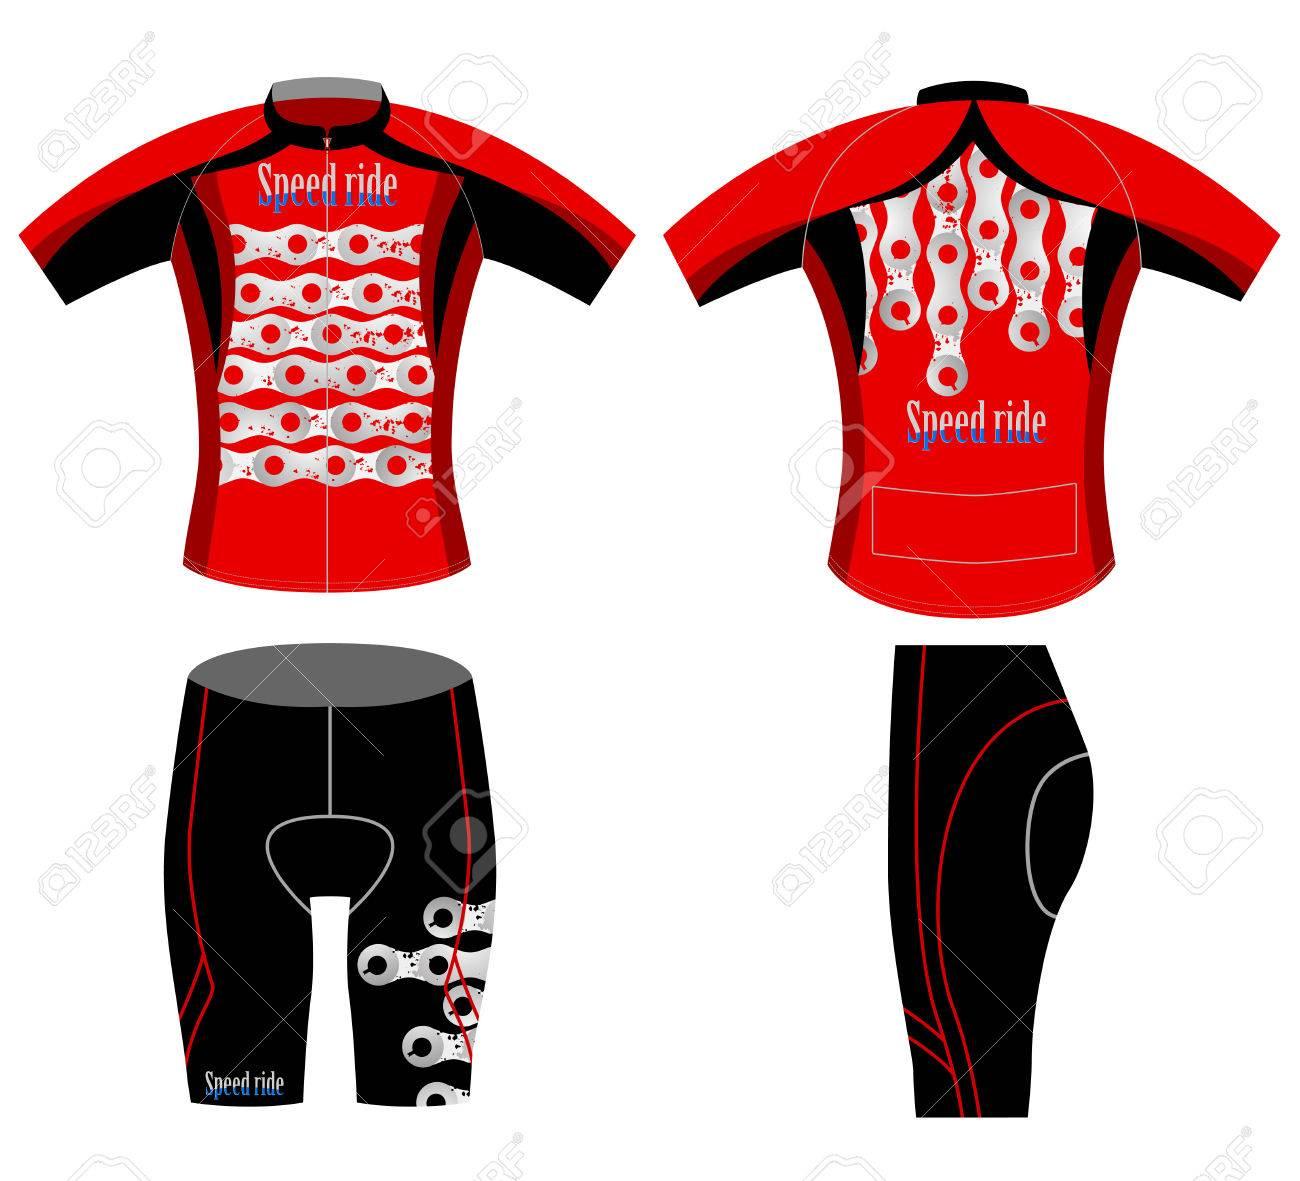 Cyclist Speedsports T Shirt Design On A White Background Royalty